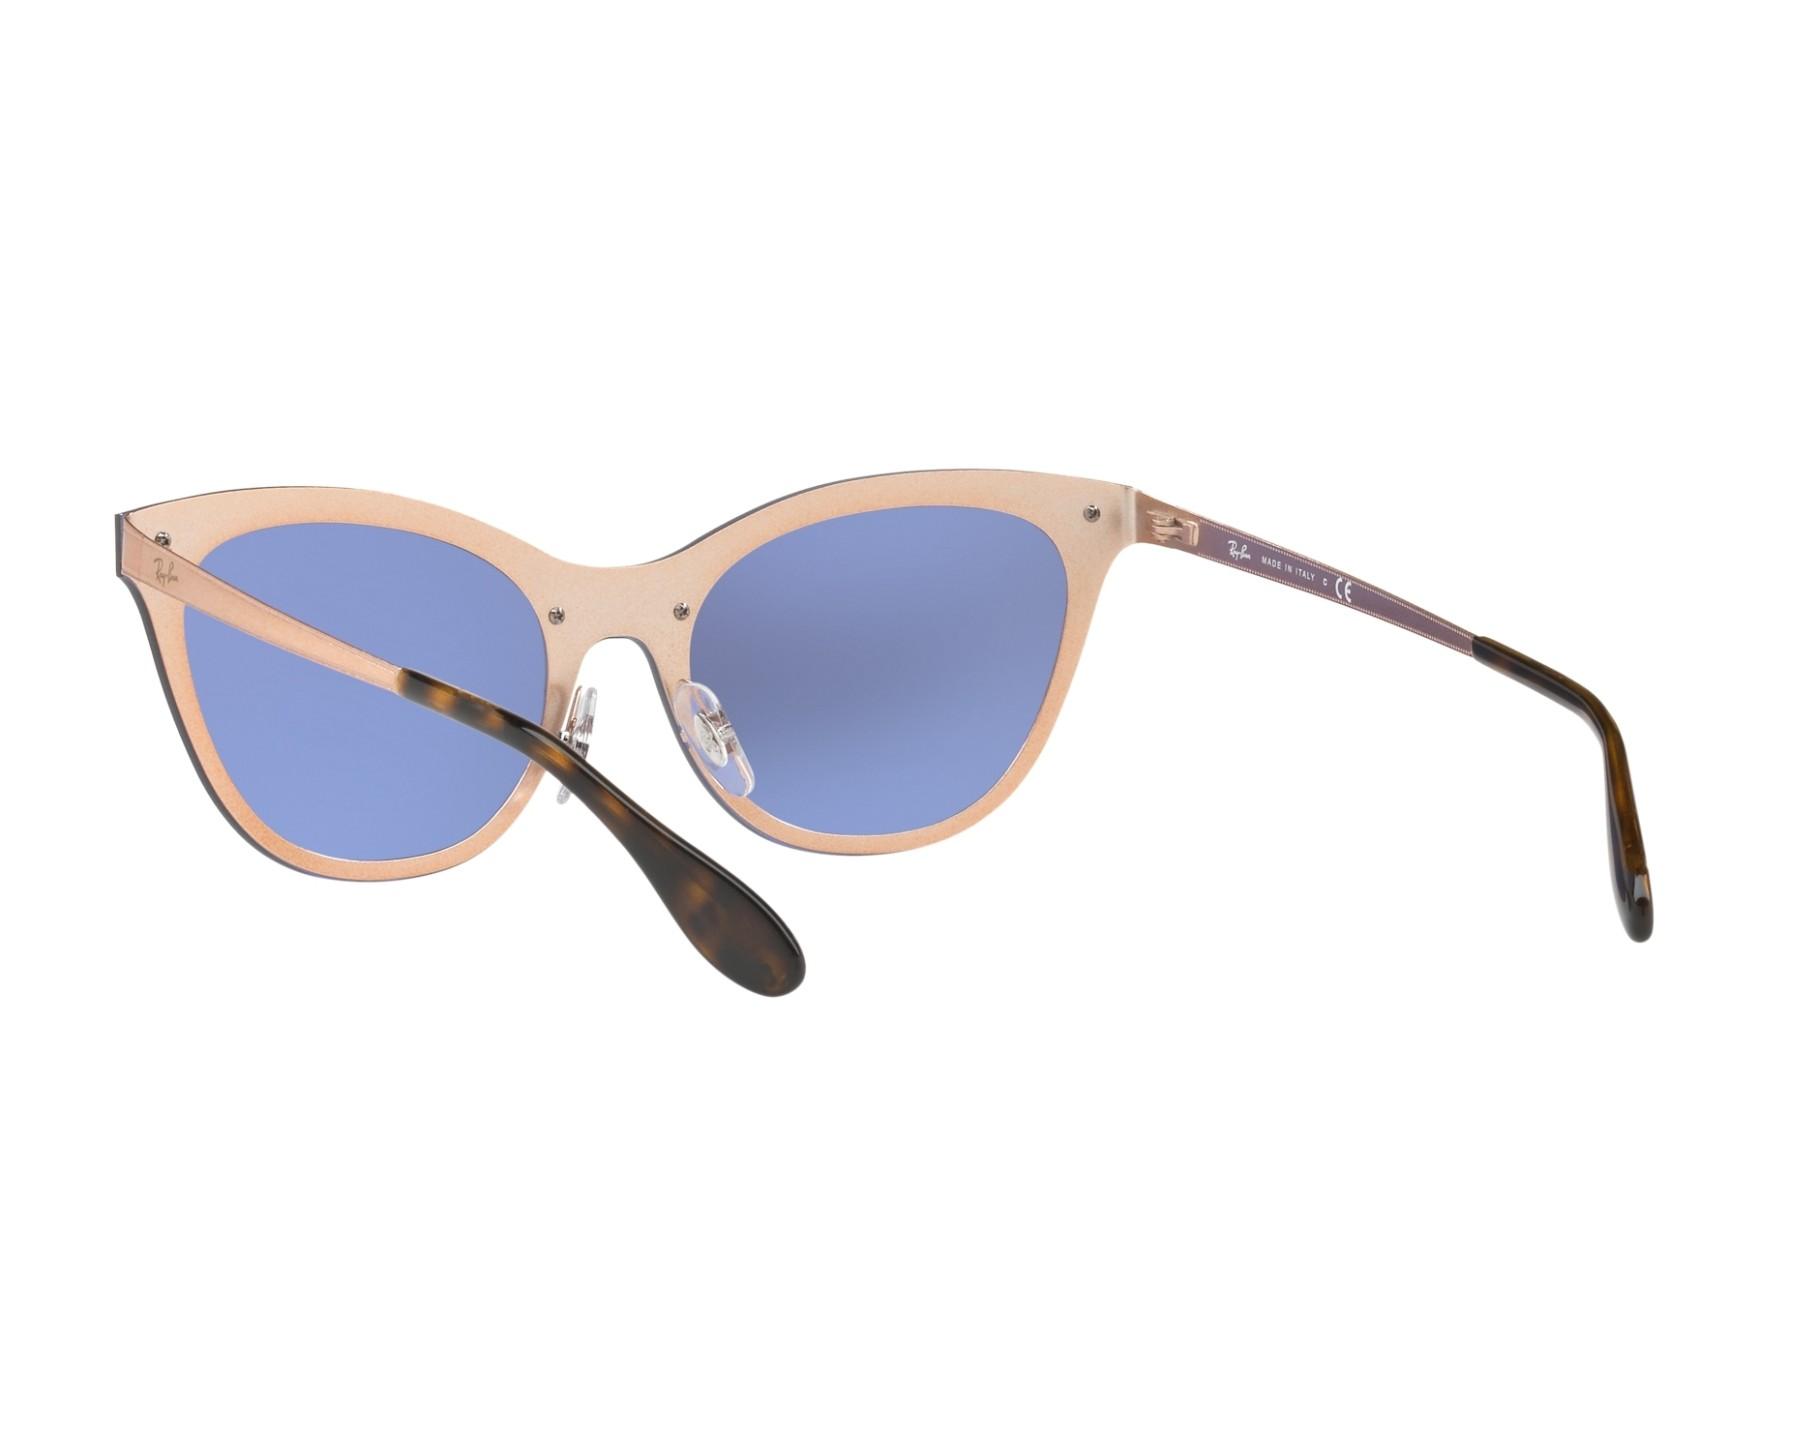 df35aa32f Sunglasses Ray-Ban RB-3580-N 90391U 43- Brass 360 degree view